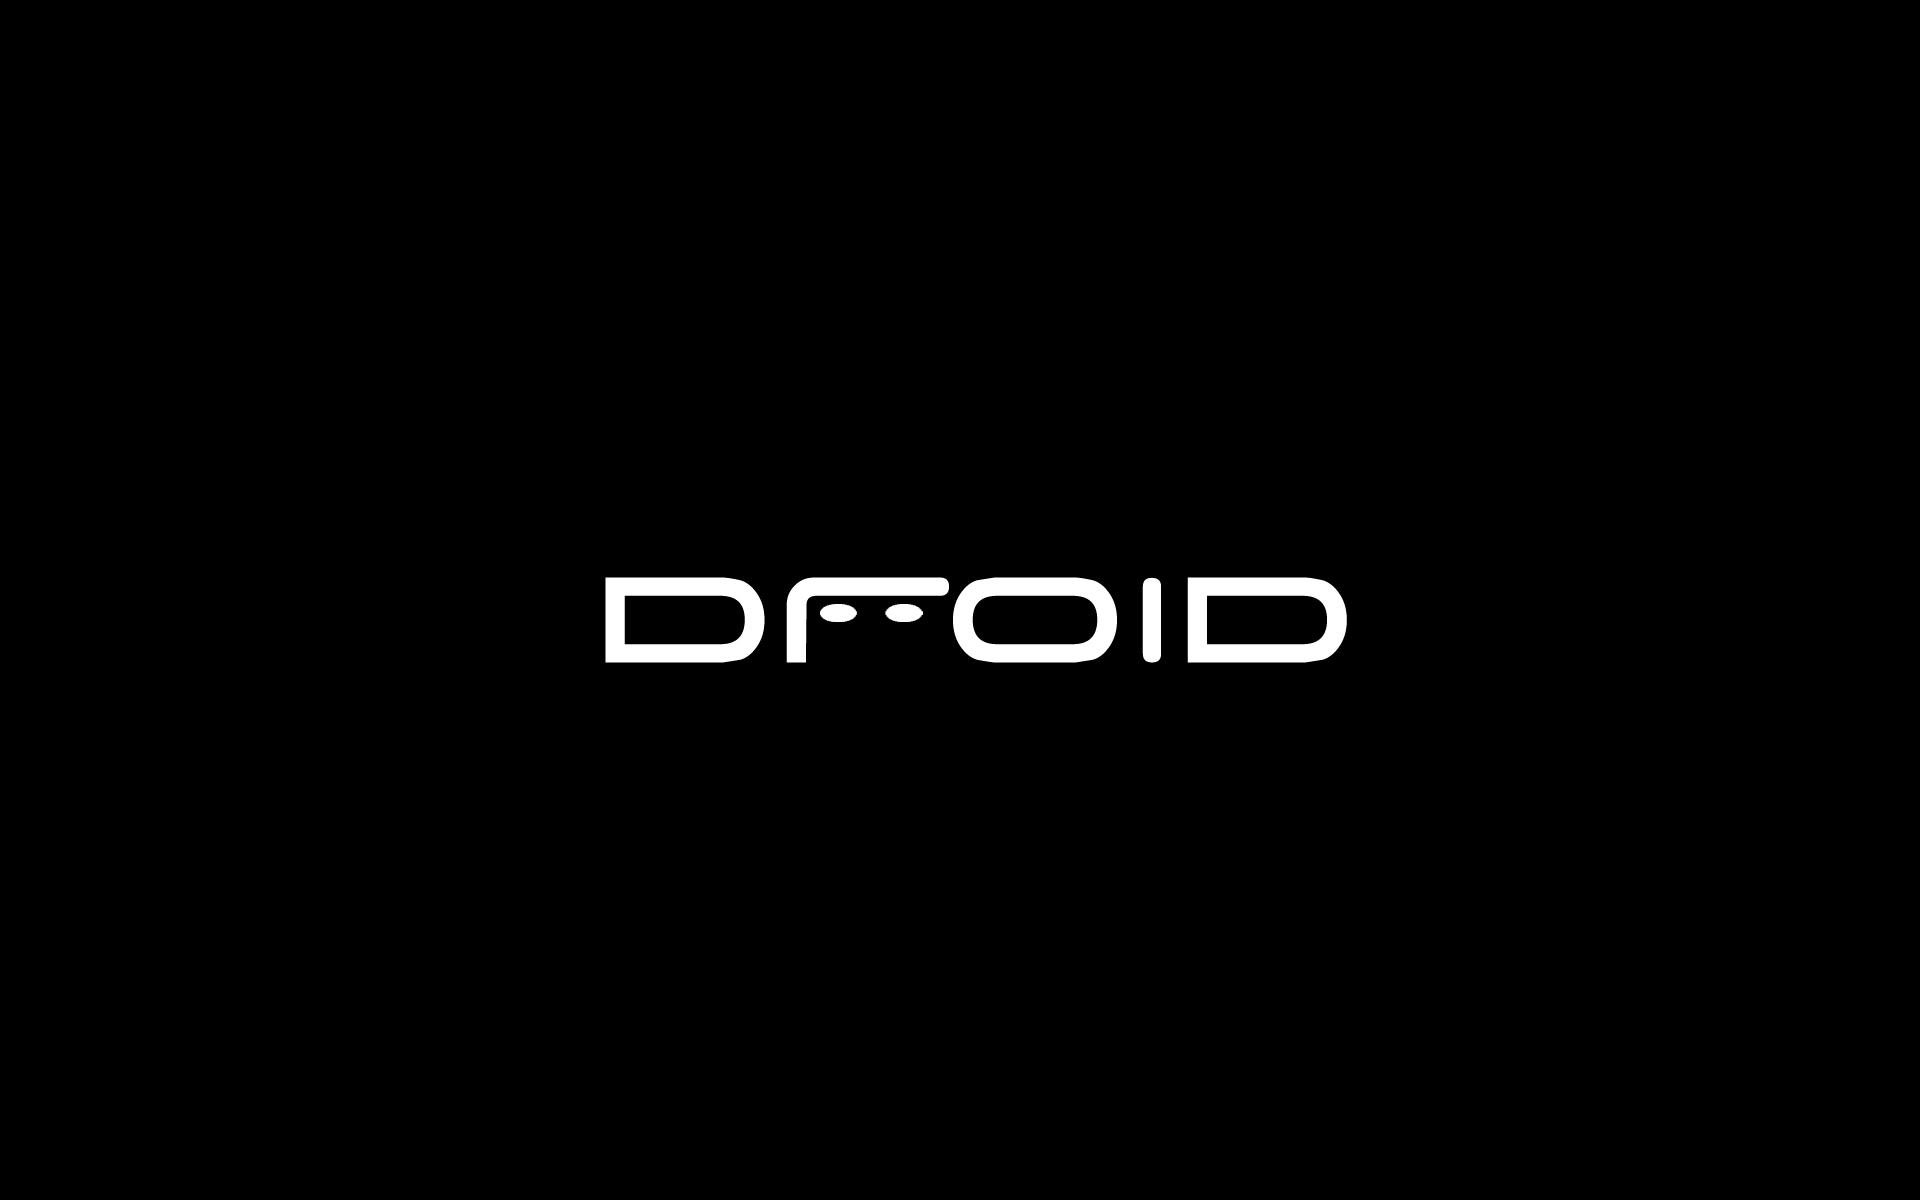 Droid Logo Wallpaper 43635